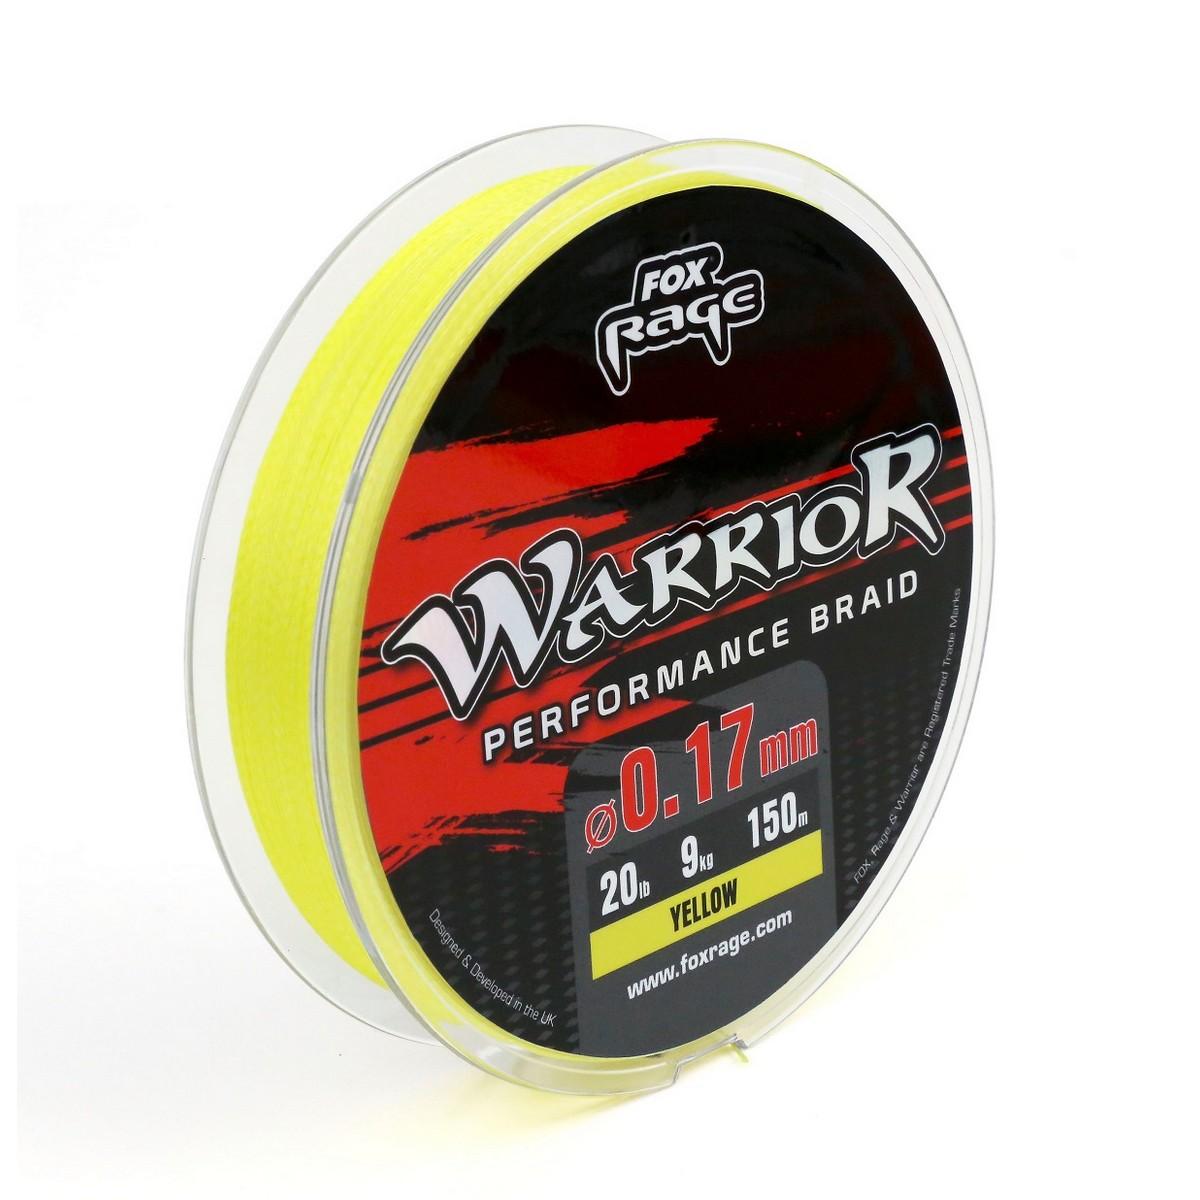 Плетено влакно Fox Rage Warrior Performance Braid